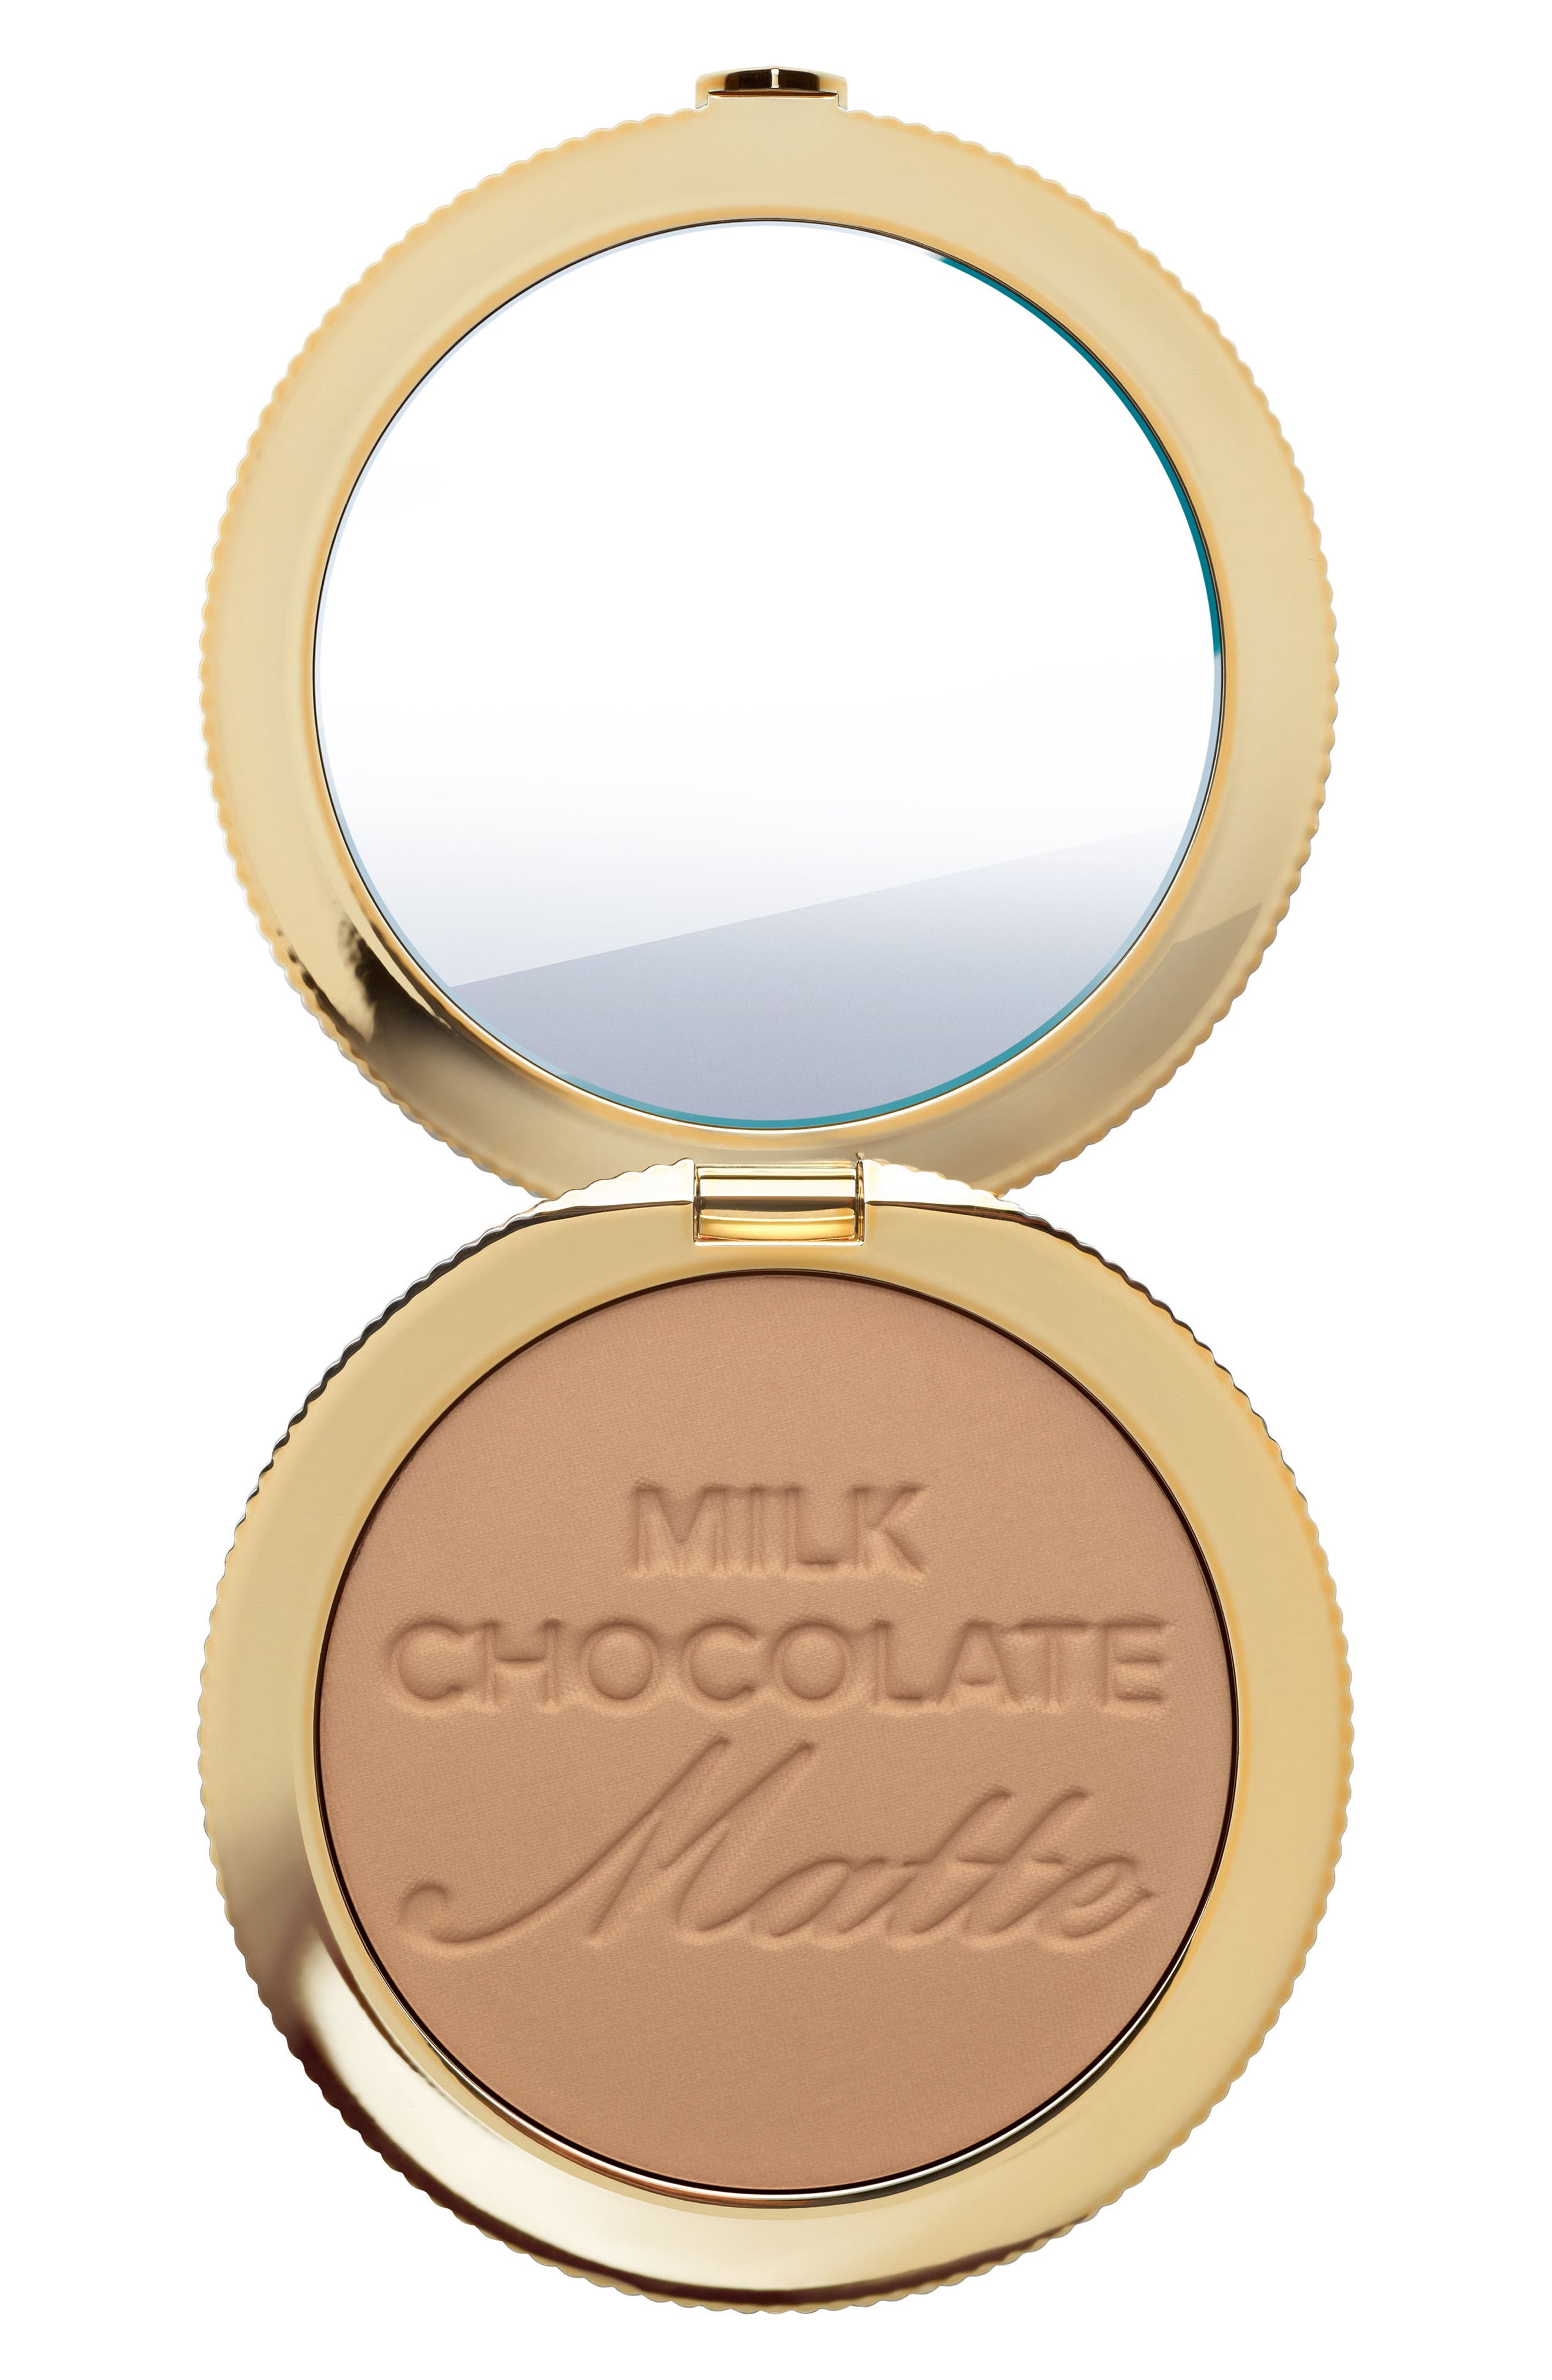 Chocolate Soleil Bronzer,                             Alternate thumbnail 4, color,                             MILK CHOCOLATE SOLEIL